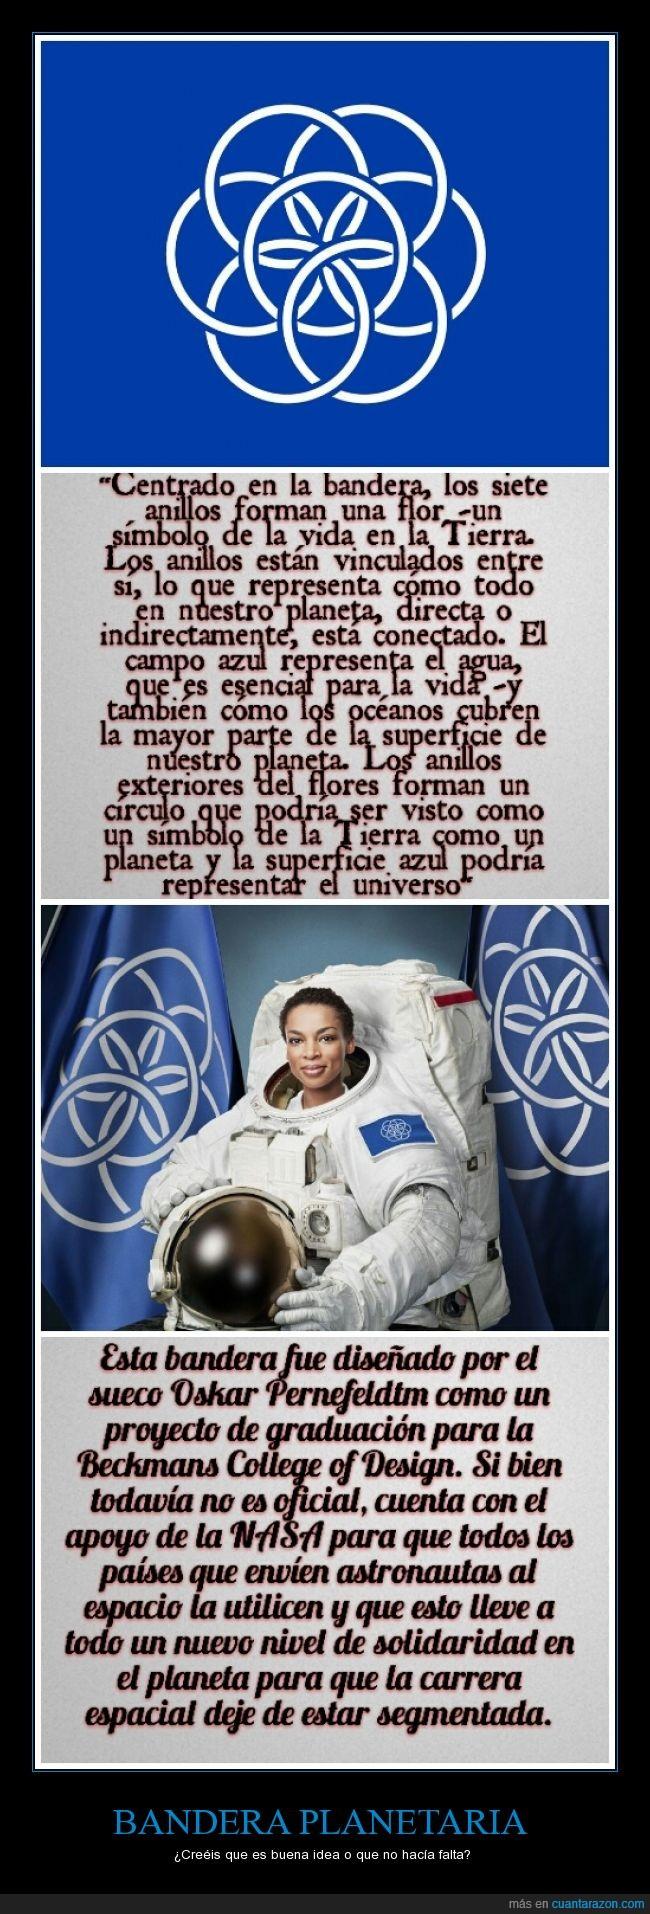 Bandera,La Tierra,NASA,Oskar Pernefeldtm,planeta,propuesta